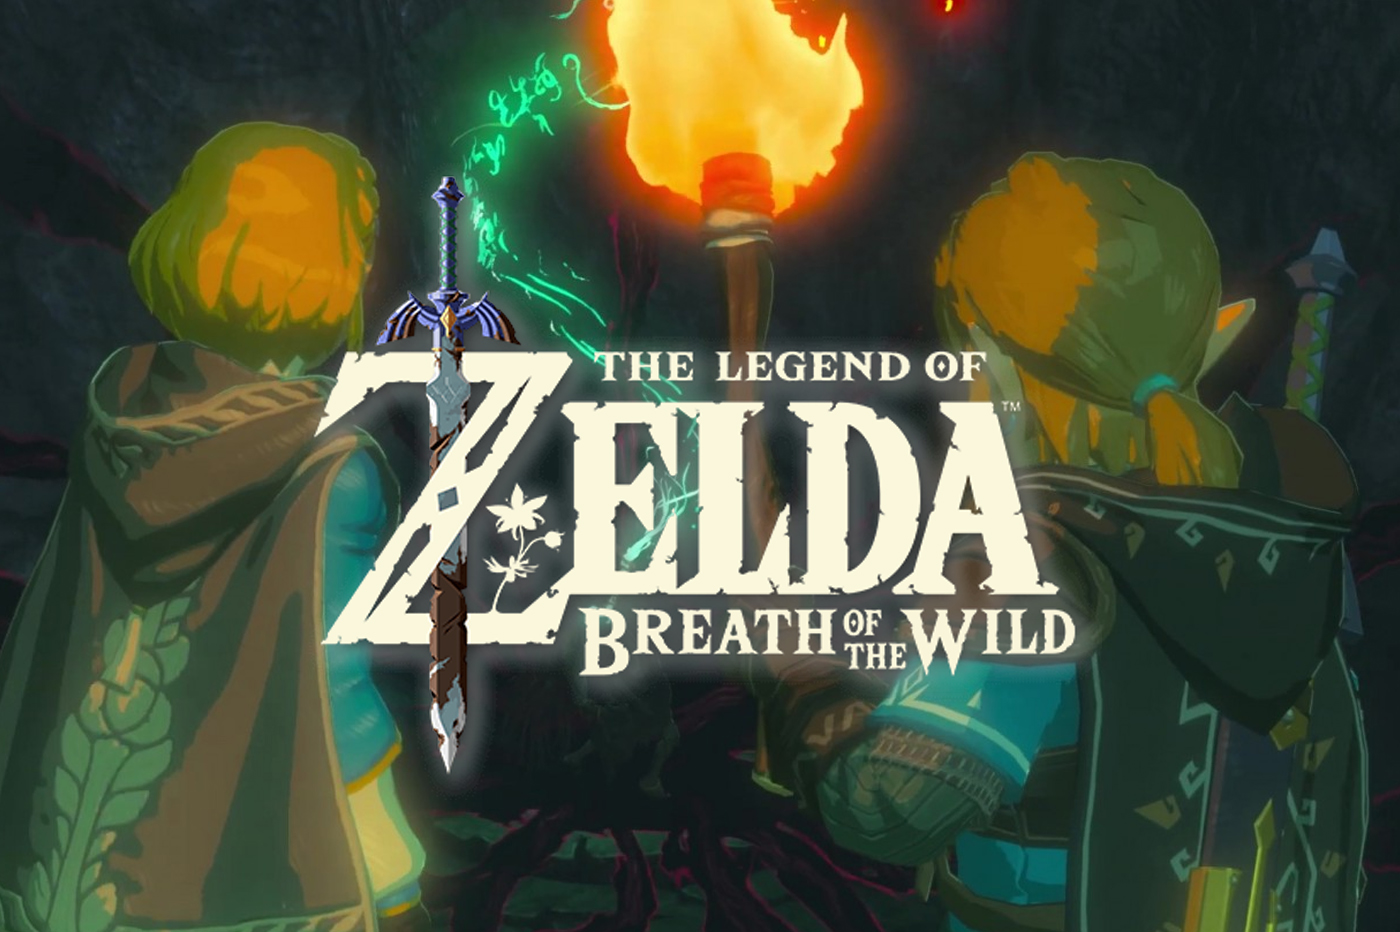 Nintendo promet que Zelda Breath of the Wild 2 sera une expérience qui dépassera le premier opus